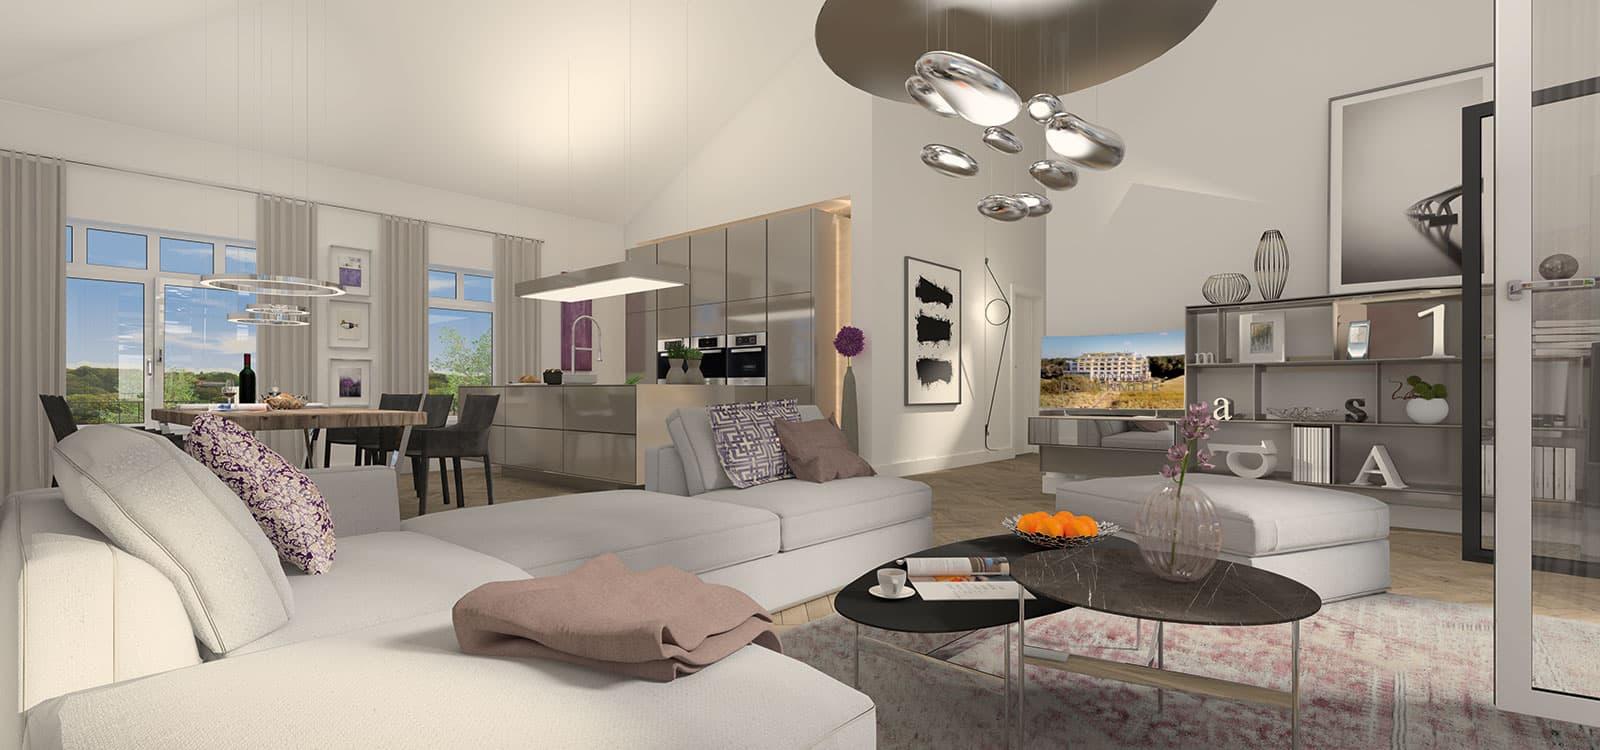 haus im haus maisonettes. Black Bedroom Furniture Sets. Home Design Ideas